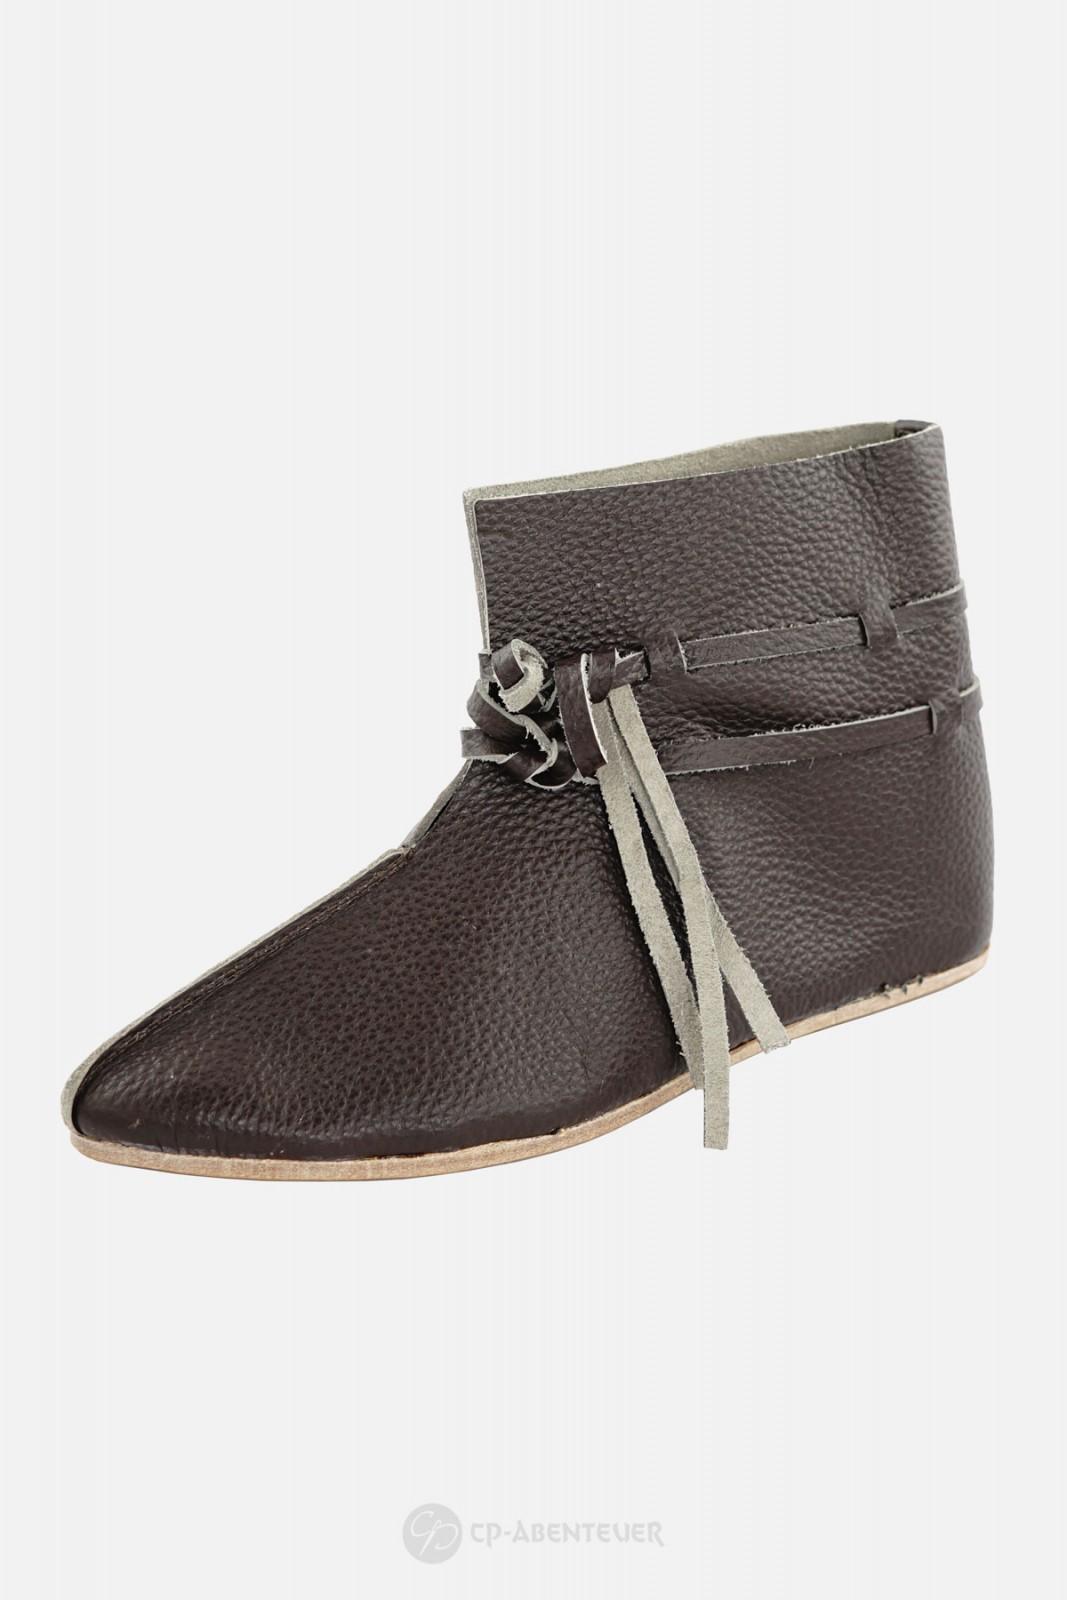 Besthard - Schuhe